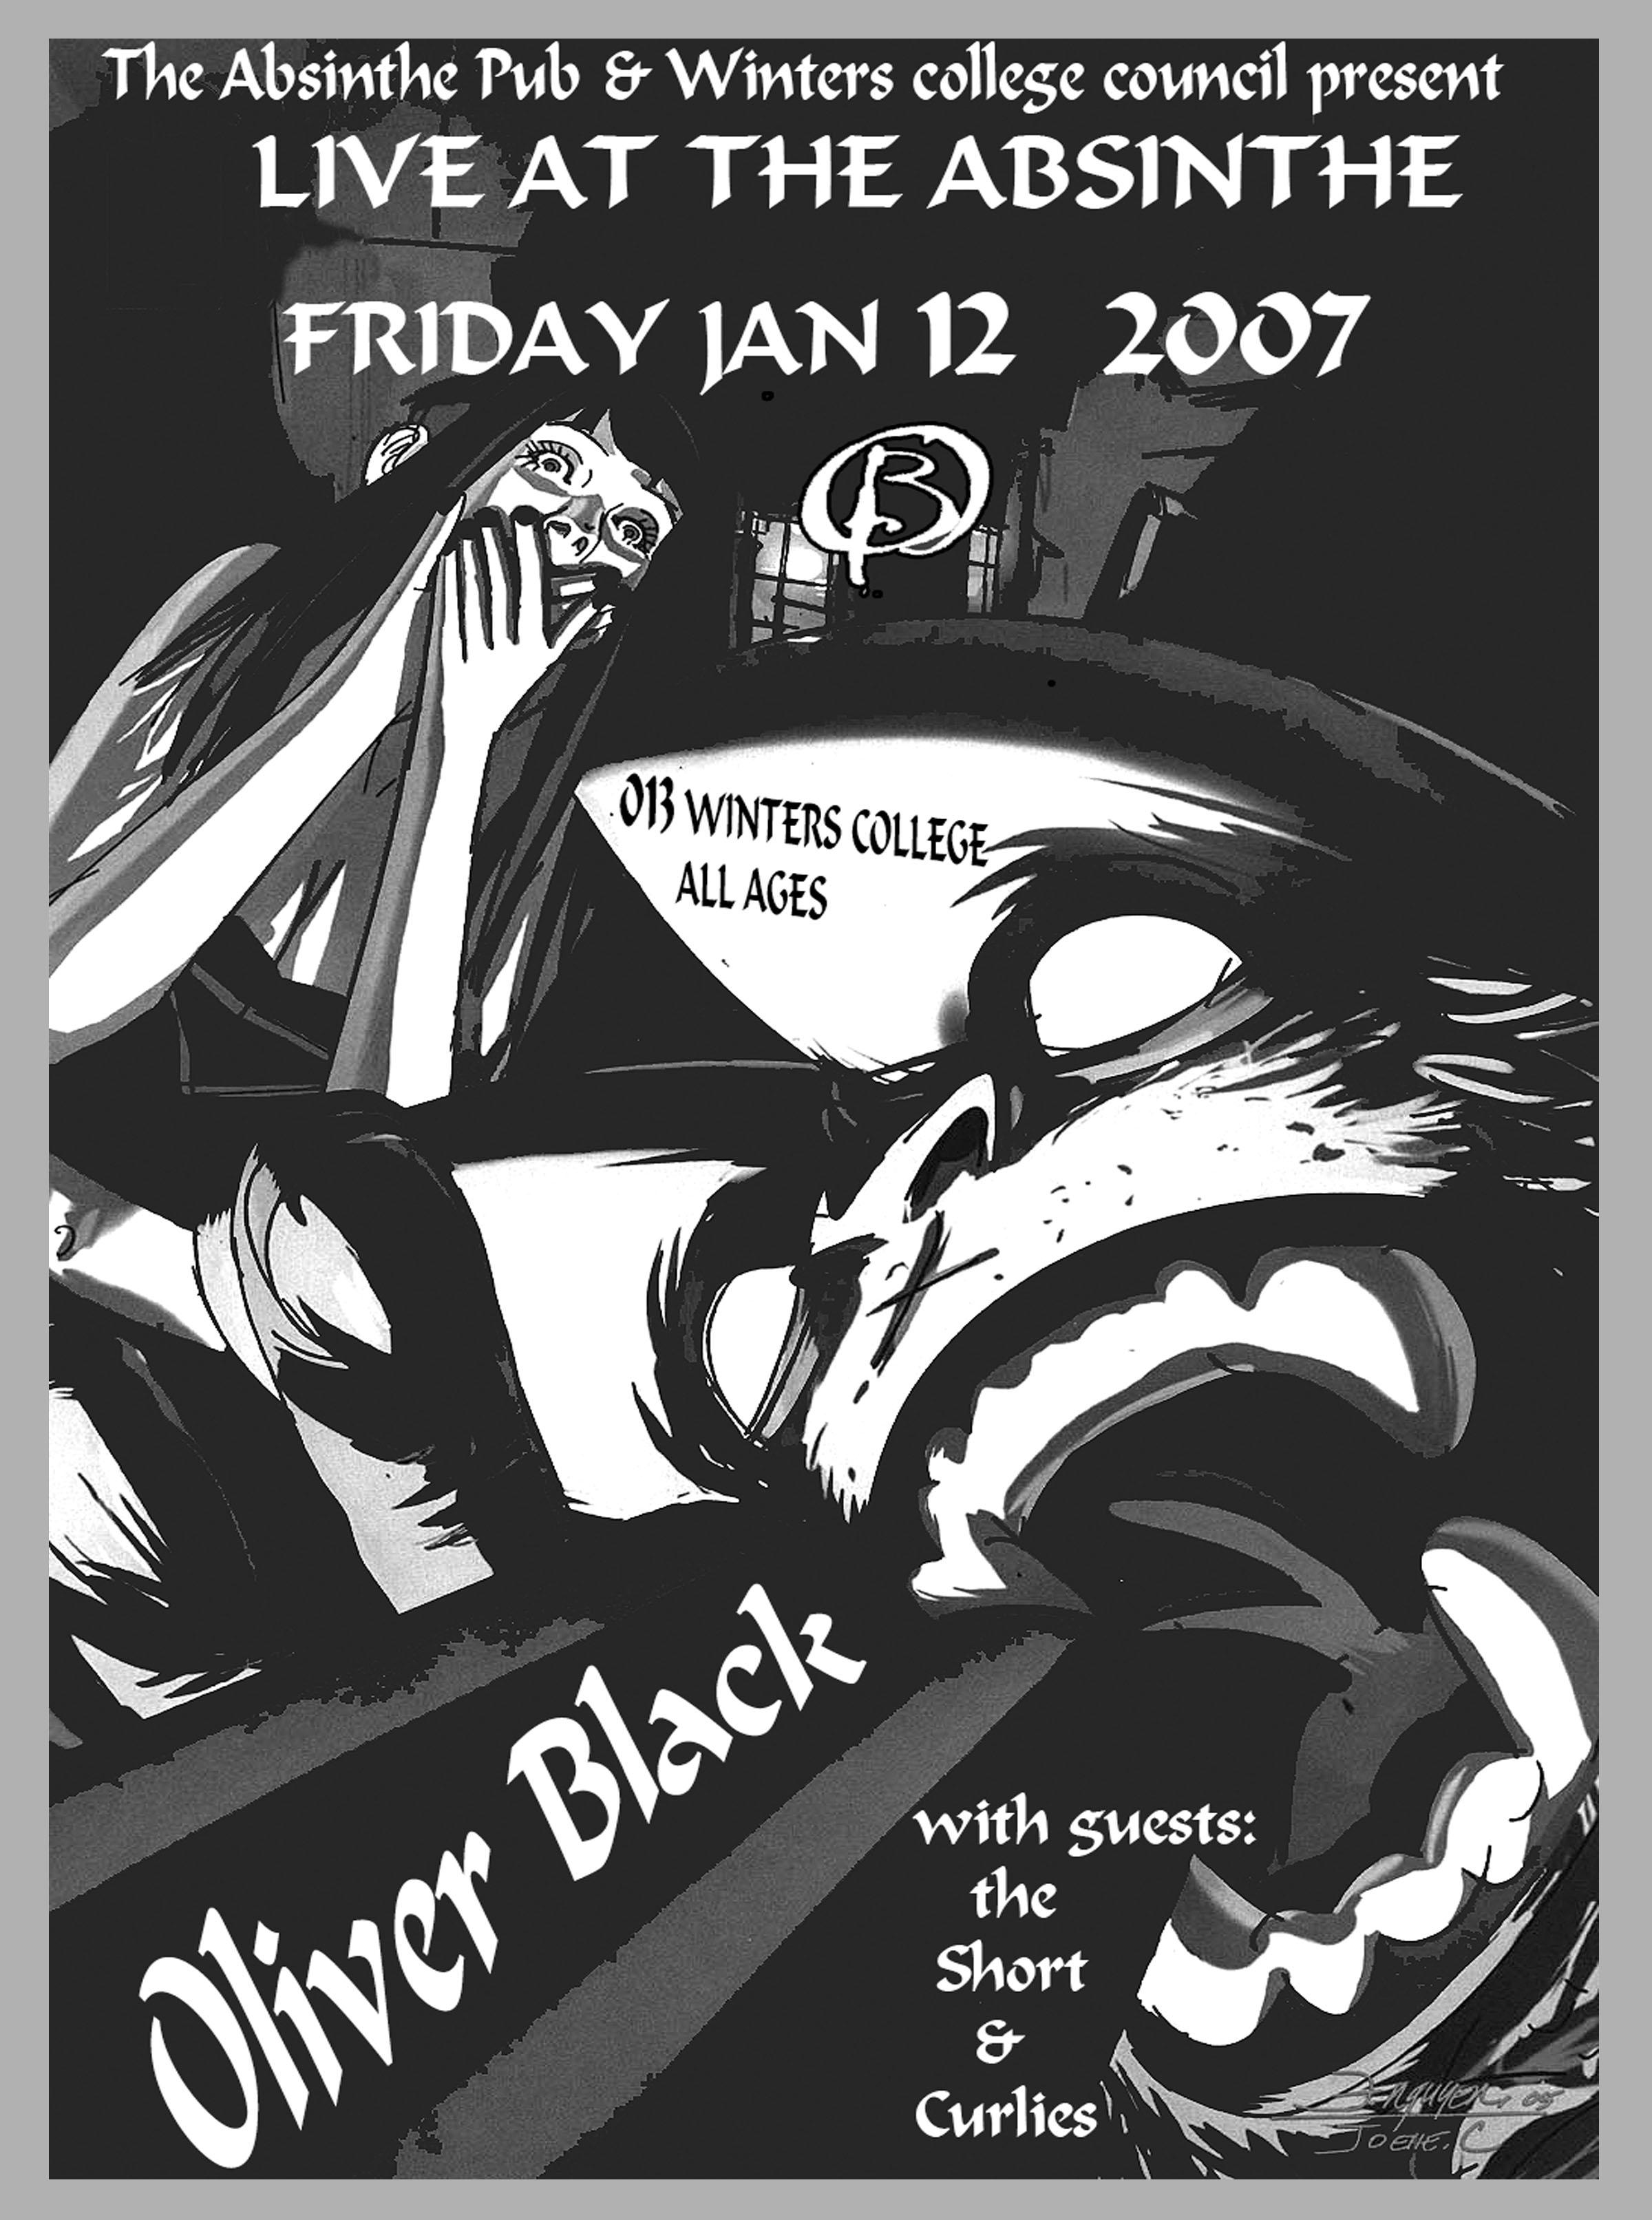 Oliver black poster.jpg